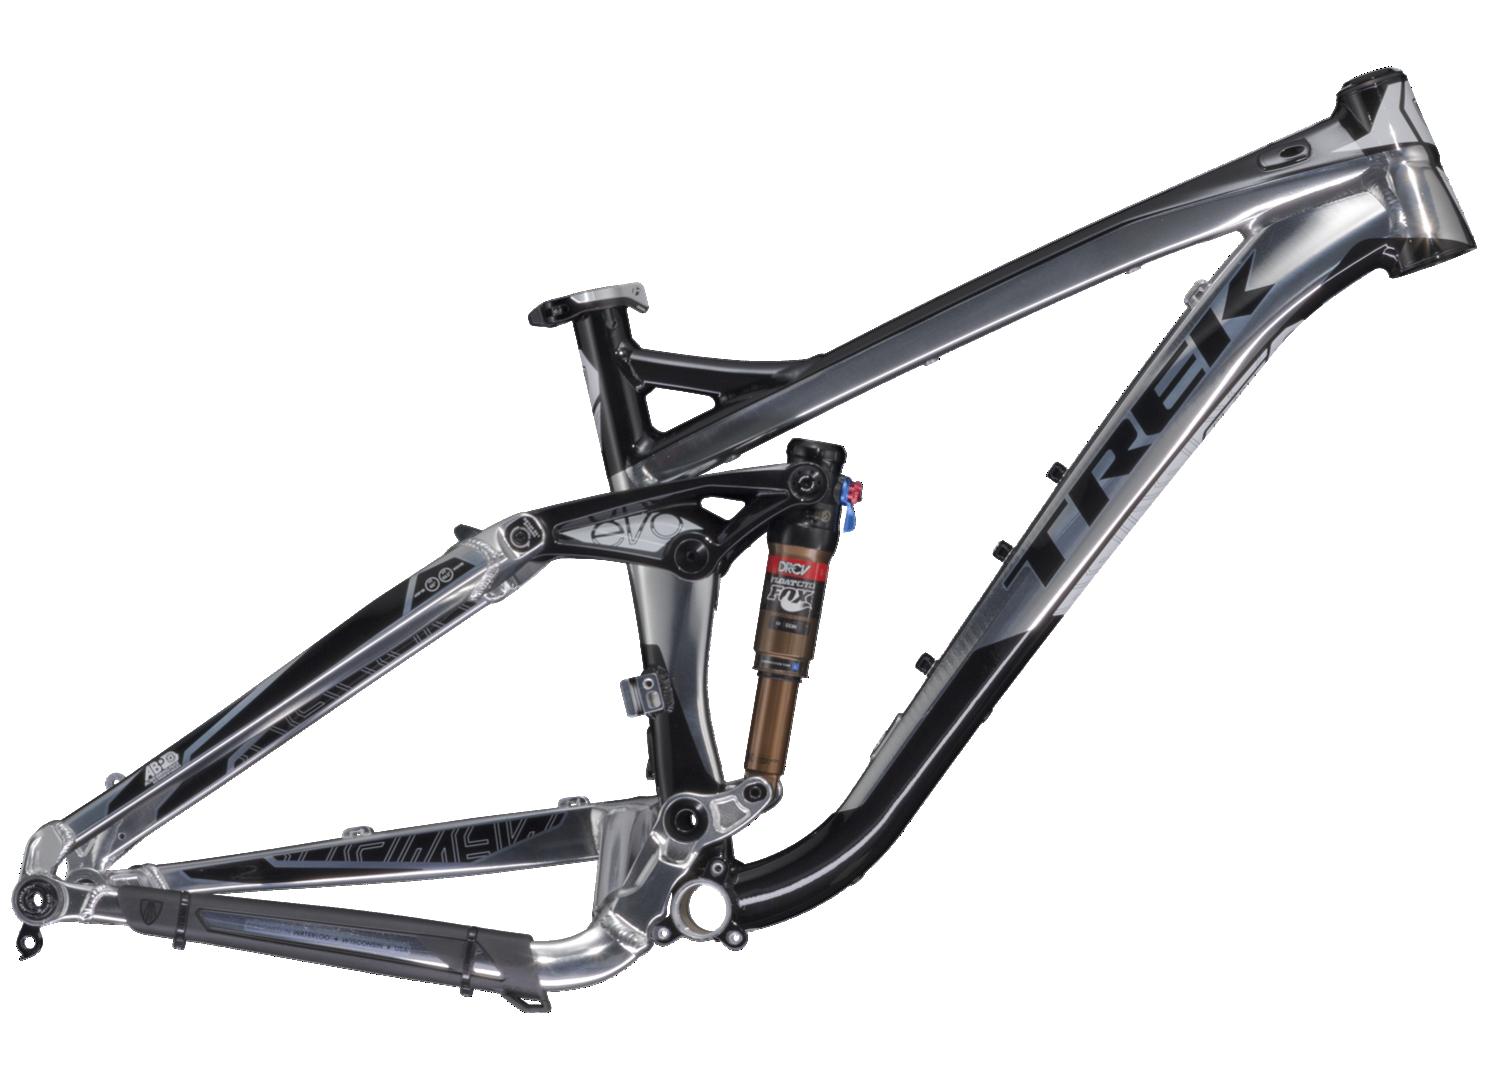 2013 Slash 9 Frame - Bike Archive - Trek Bicycle